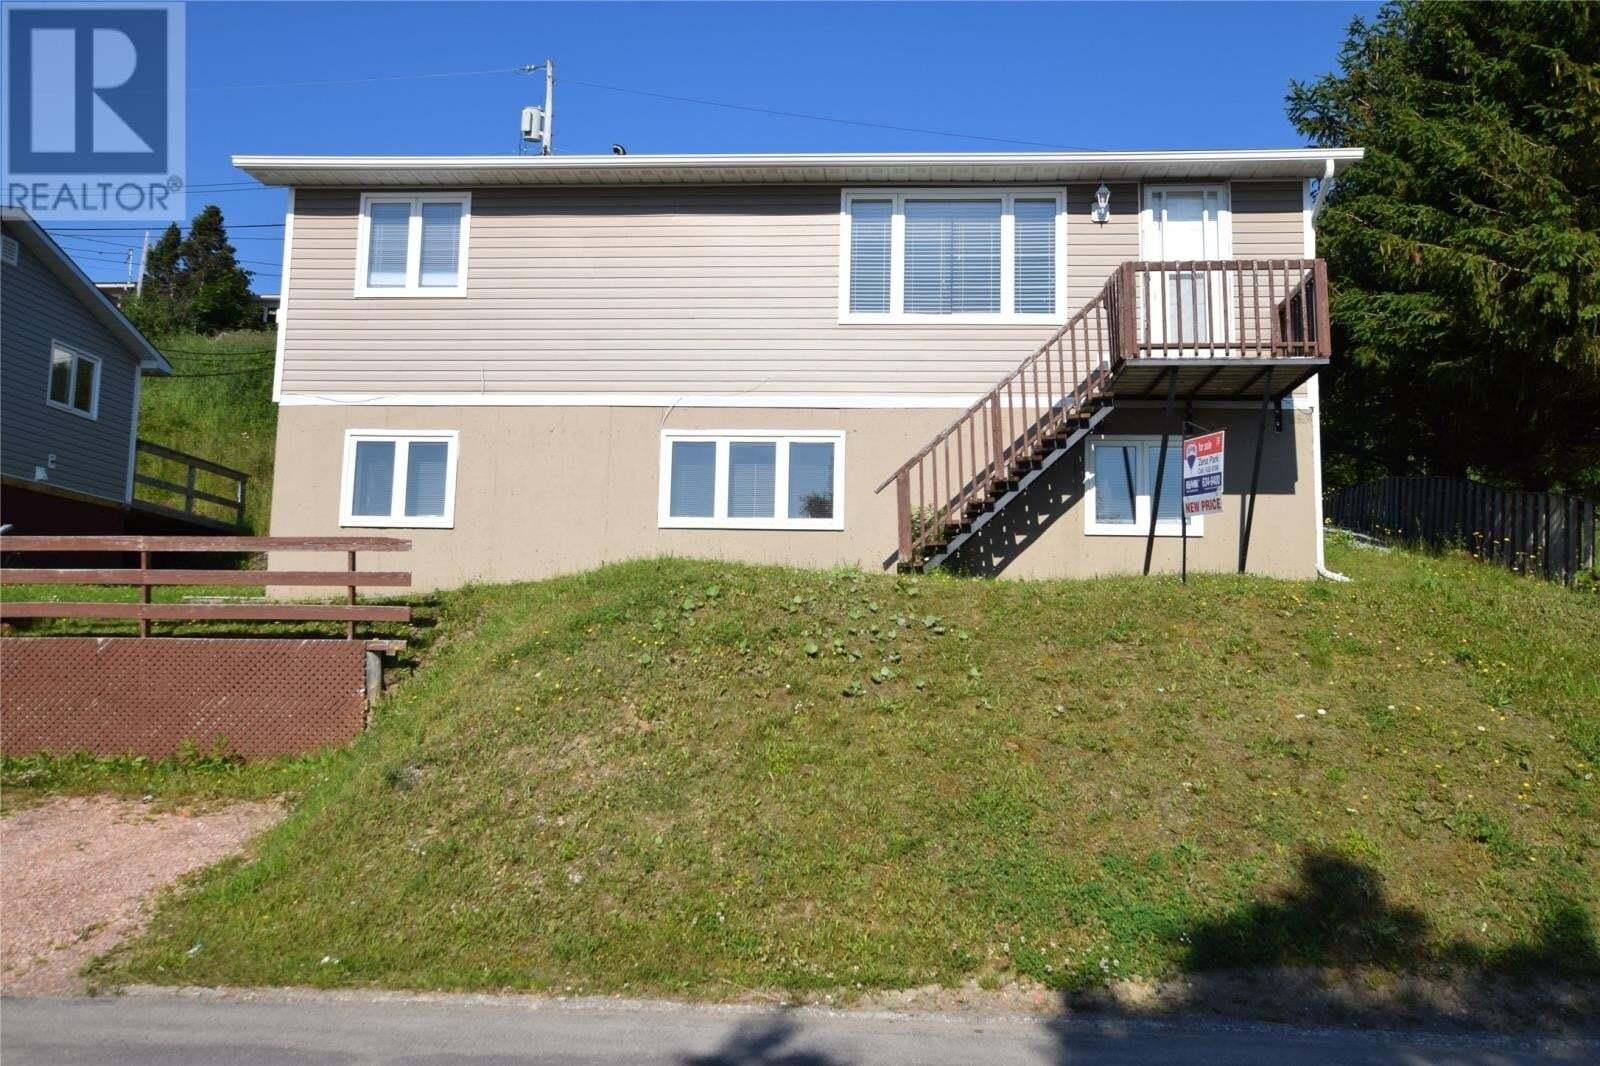 House for sale at 33 Golden Glow Ave Corner Brook Newfoundland - MLS: 1199851